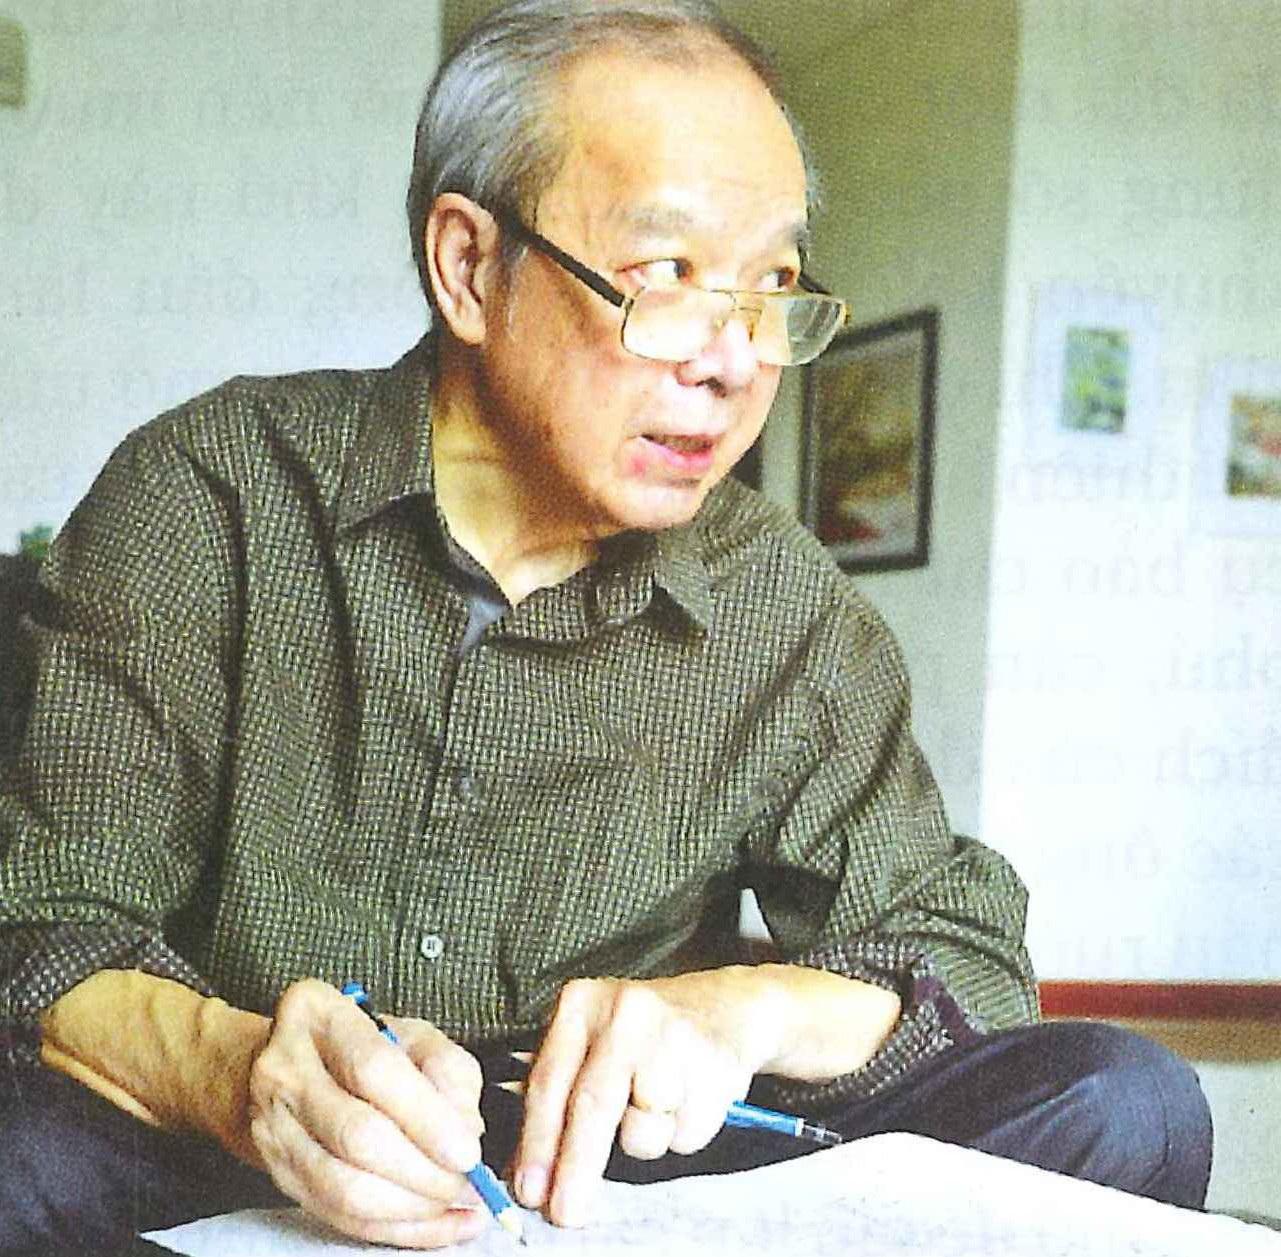 Overseas Vietnamese artist running 'negative painting' exhibit in homeland